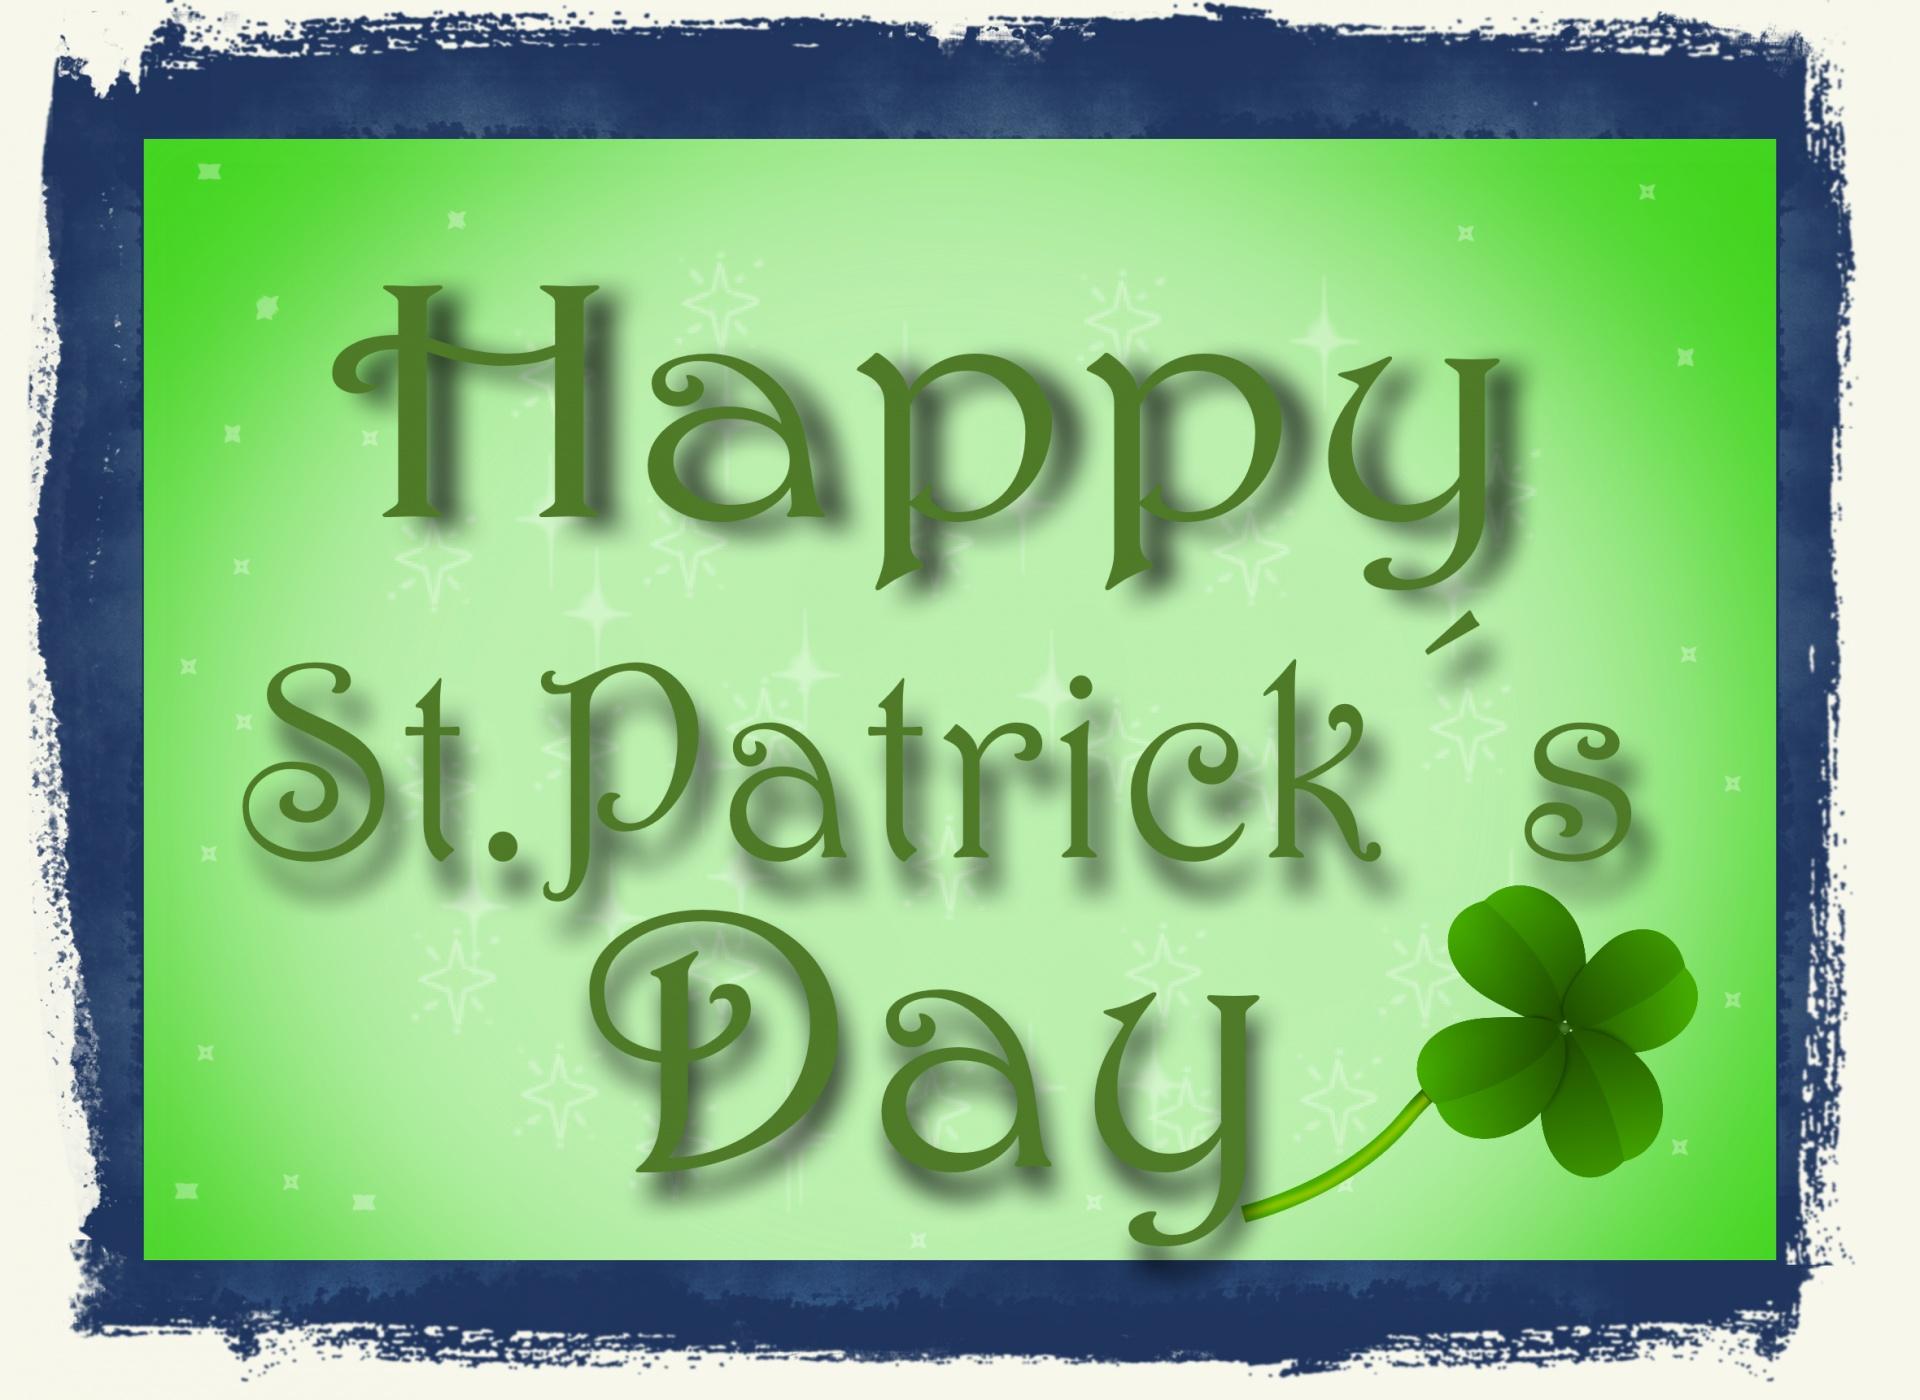 Irish Holiday, St. Patrick's Day, Wear Green